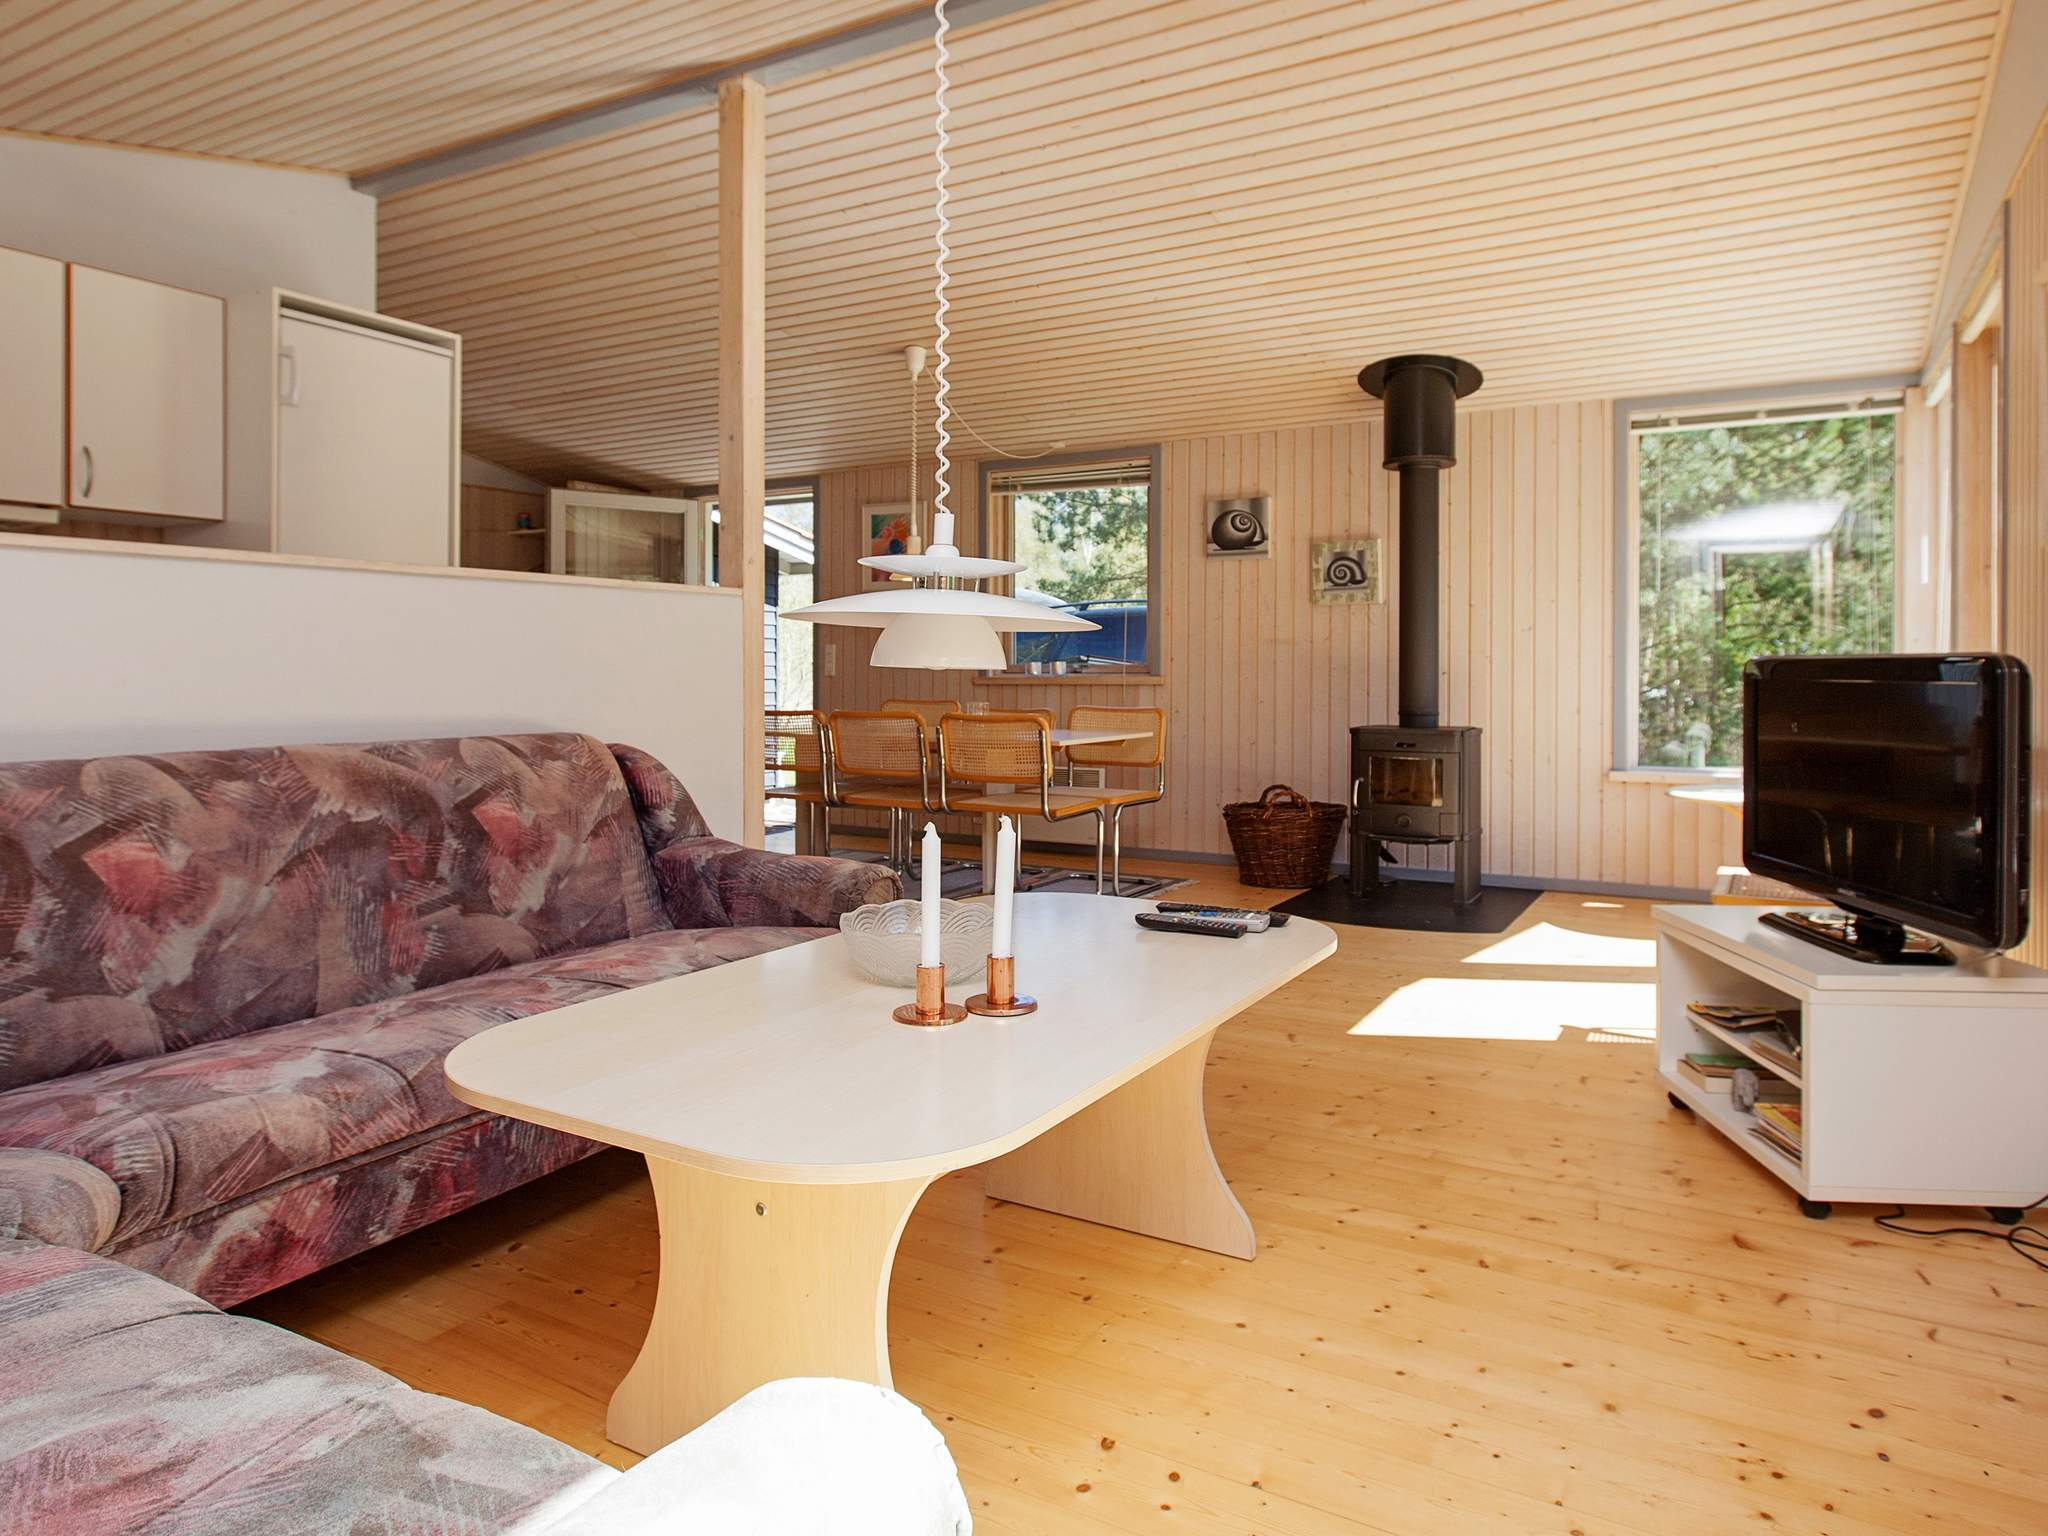 Ferienhaus Overby Lyng (93506), Nykøbing Sj, , Westseeland, Dänemark, Bild 6